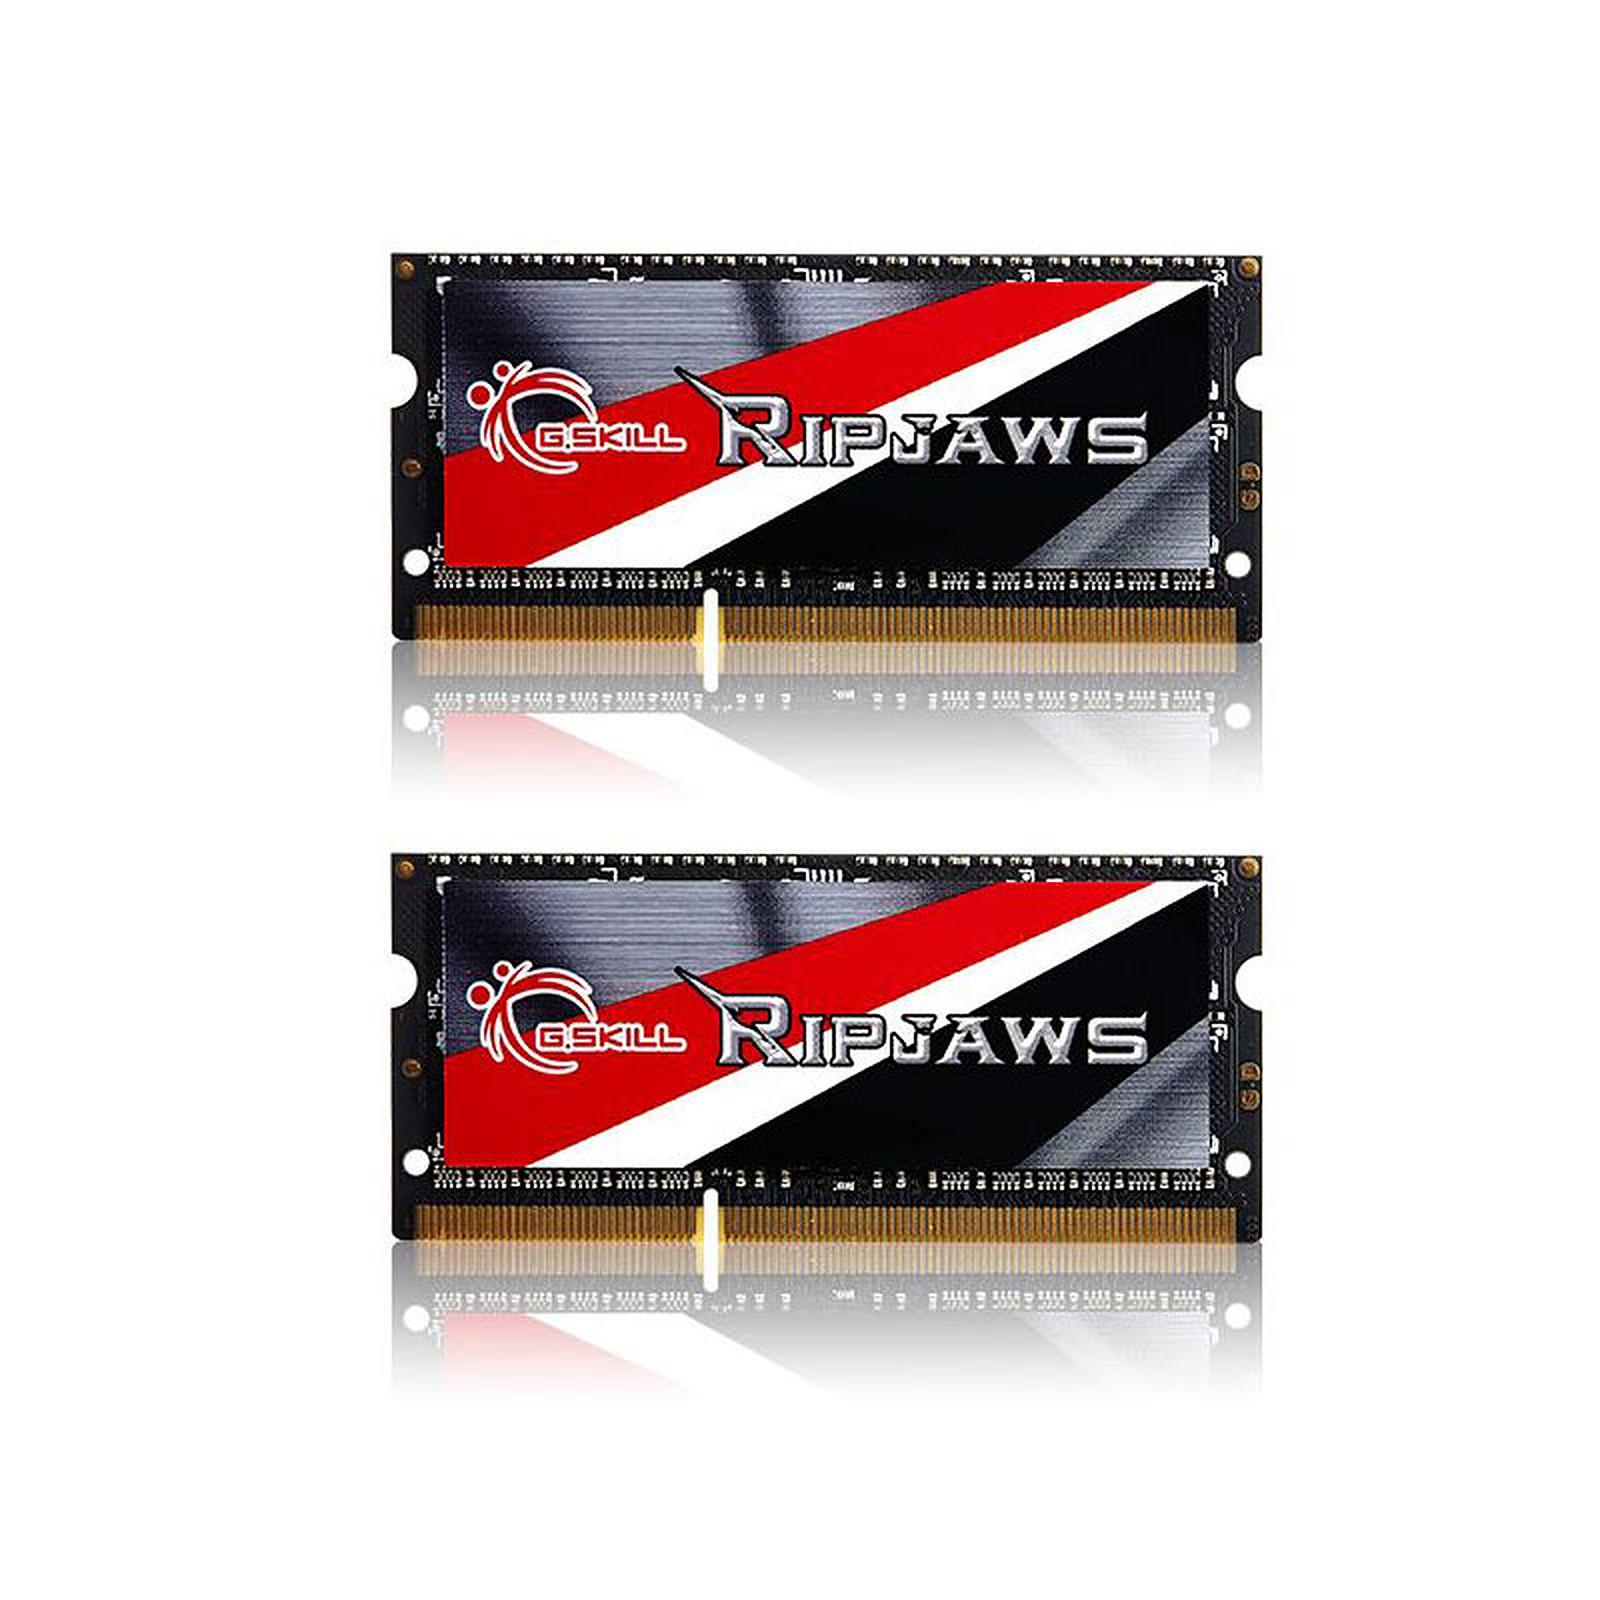 G.Skill RipJaws Series SO-DIMM 16 Go (2 x 8 Go) DDR3 1866 MHz CL11